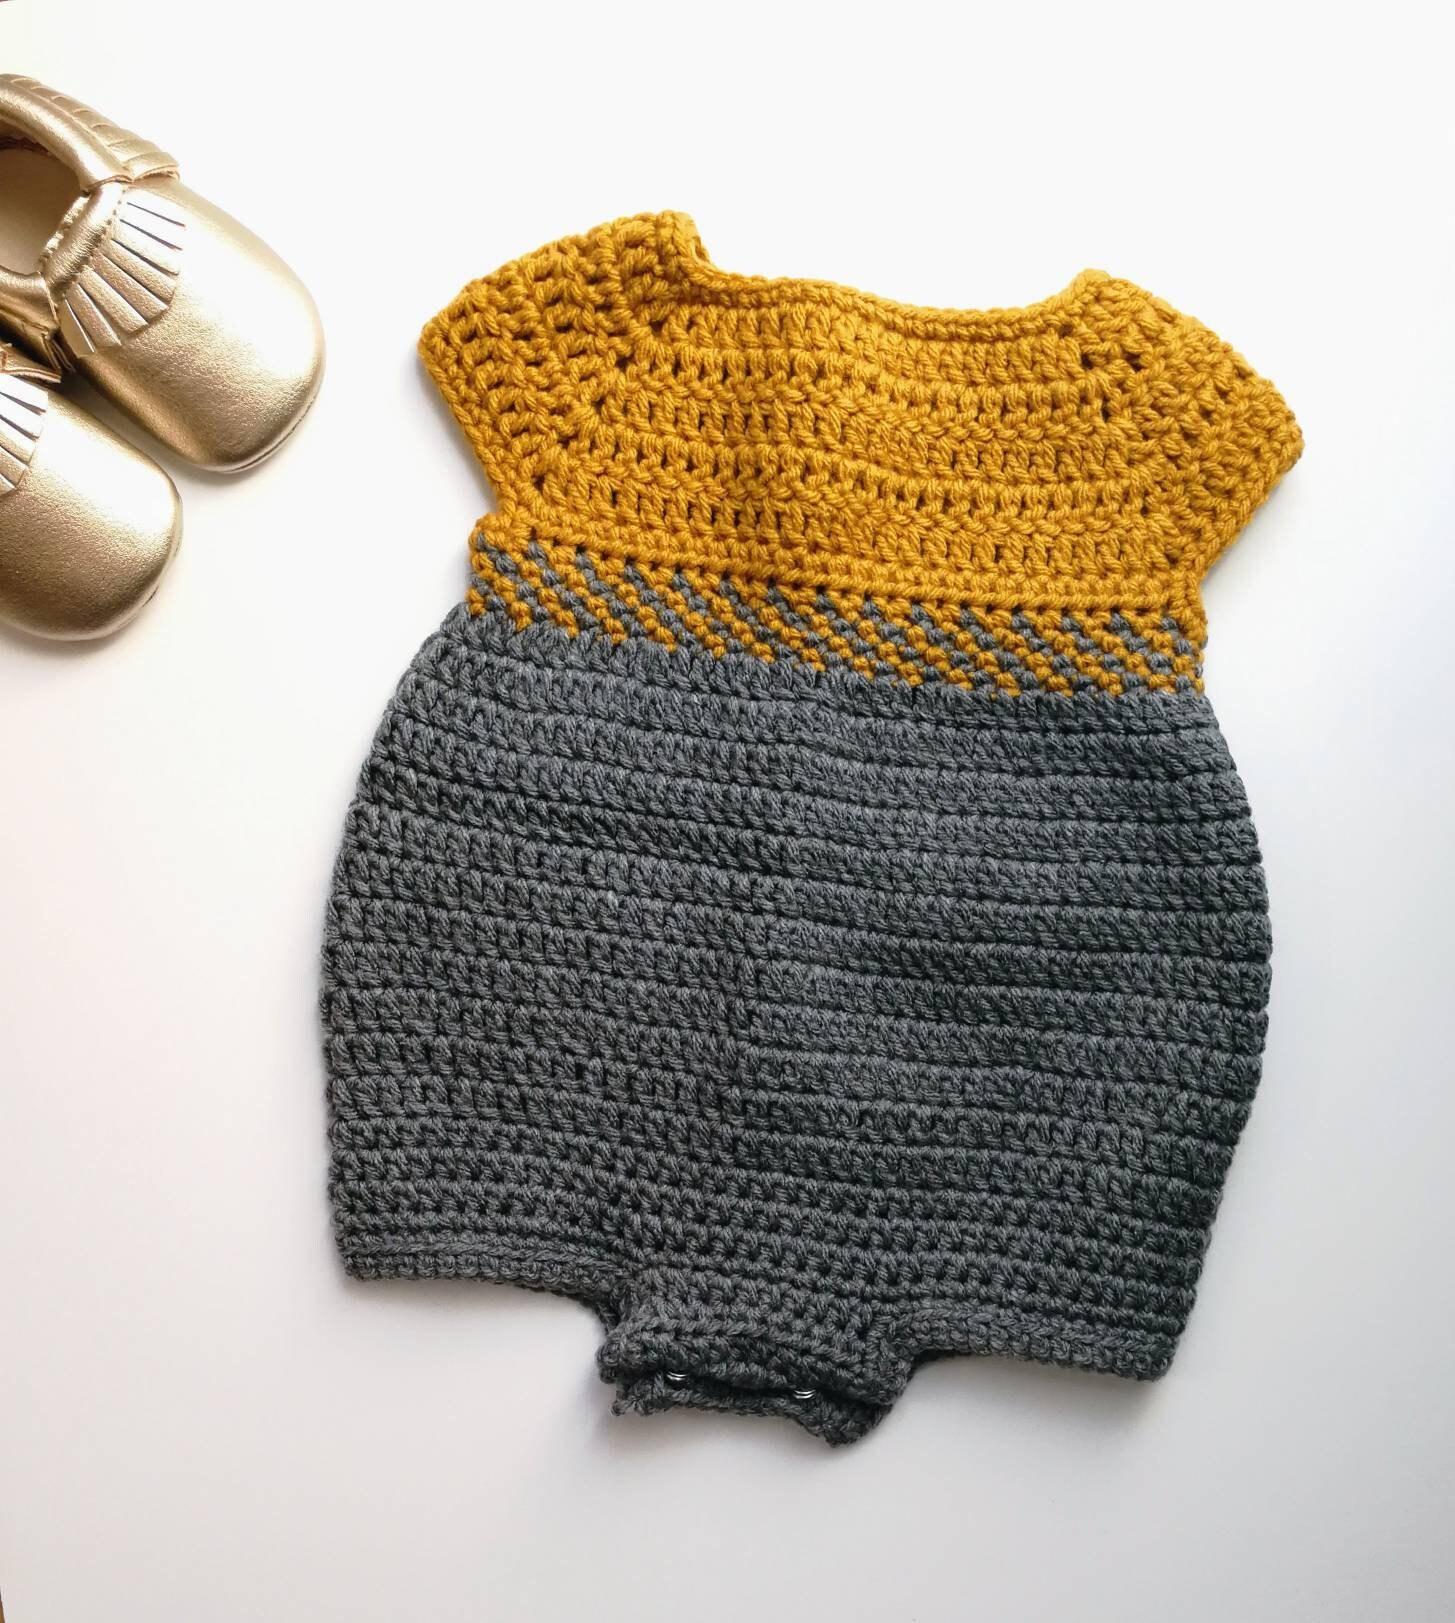 Beautiful Häkeln Babymütze Muster 6 12 Monate Component - Decke ...